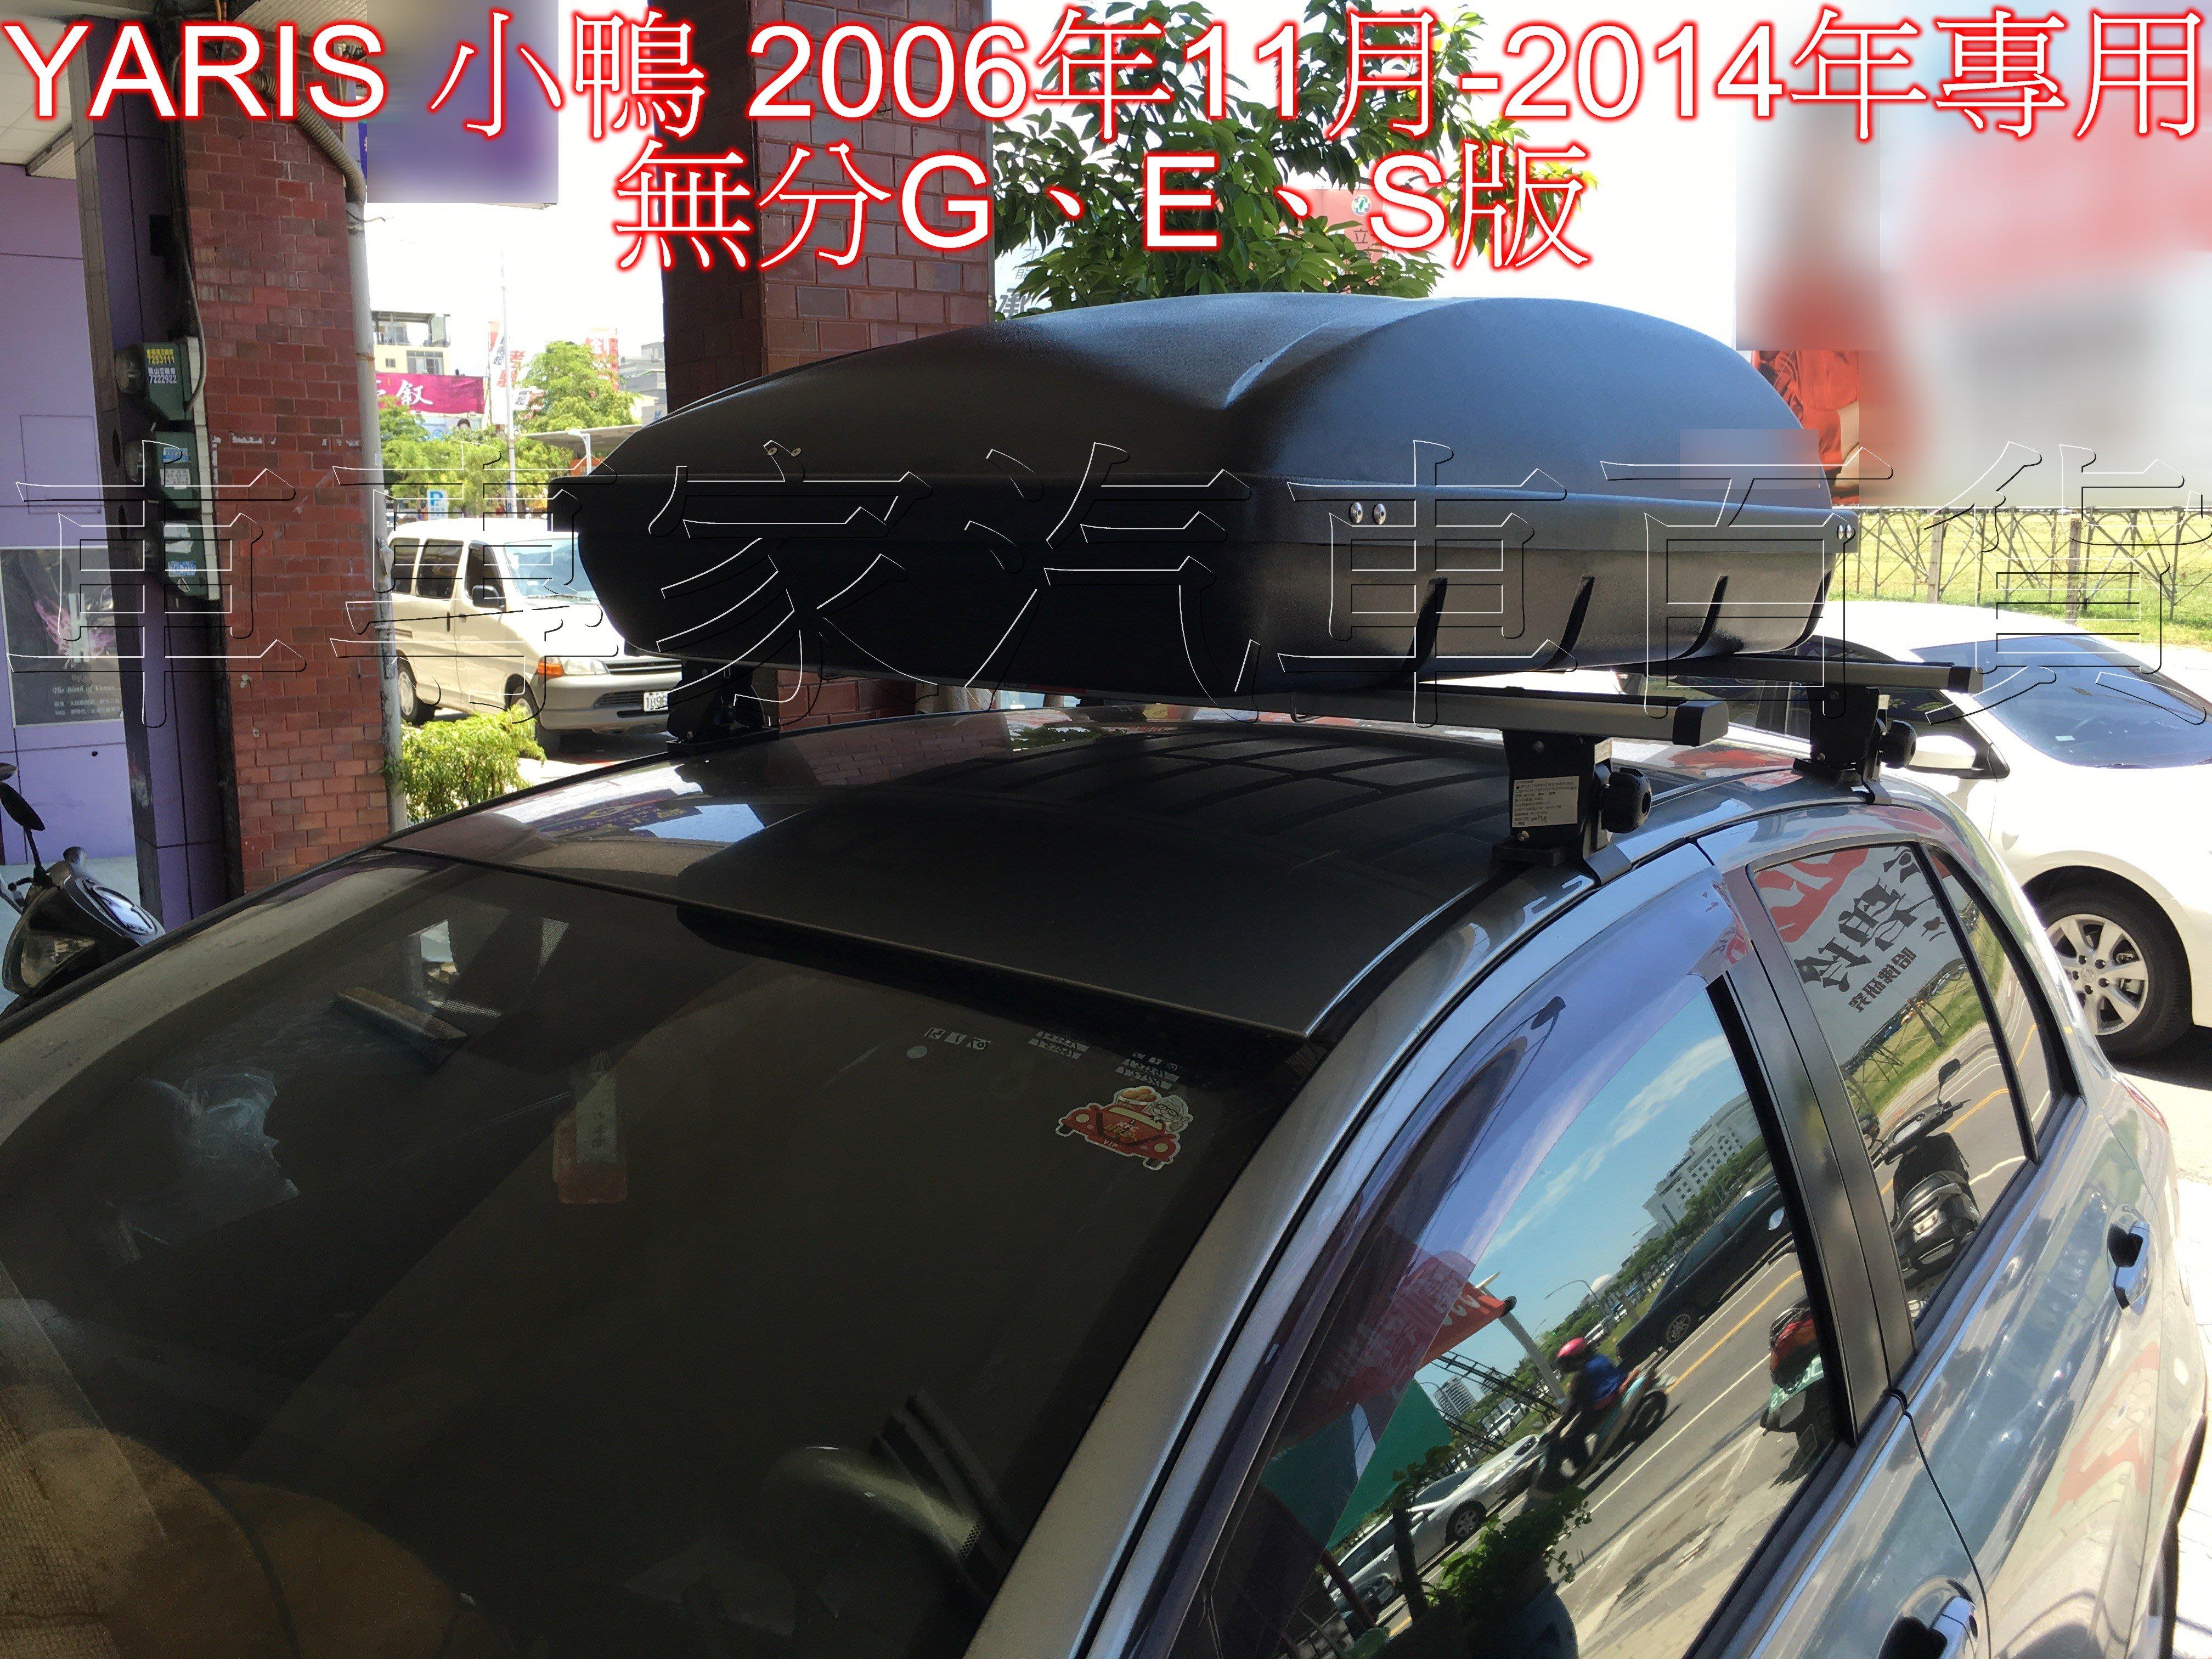 TOYOTA 豐田 YARIS 小鴨 橫桿、車頂行李架、車頂架、置物架二橫桿 2006年11月-2014年專用